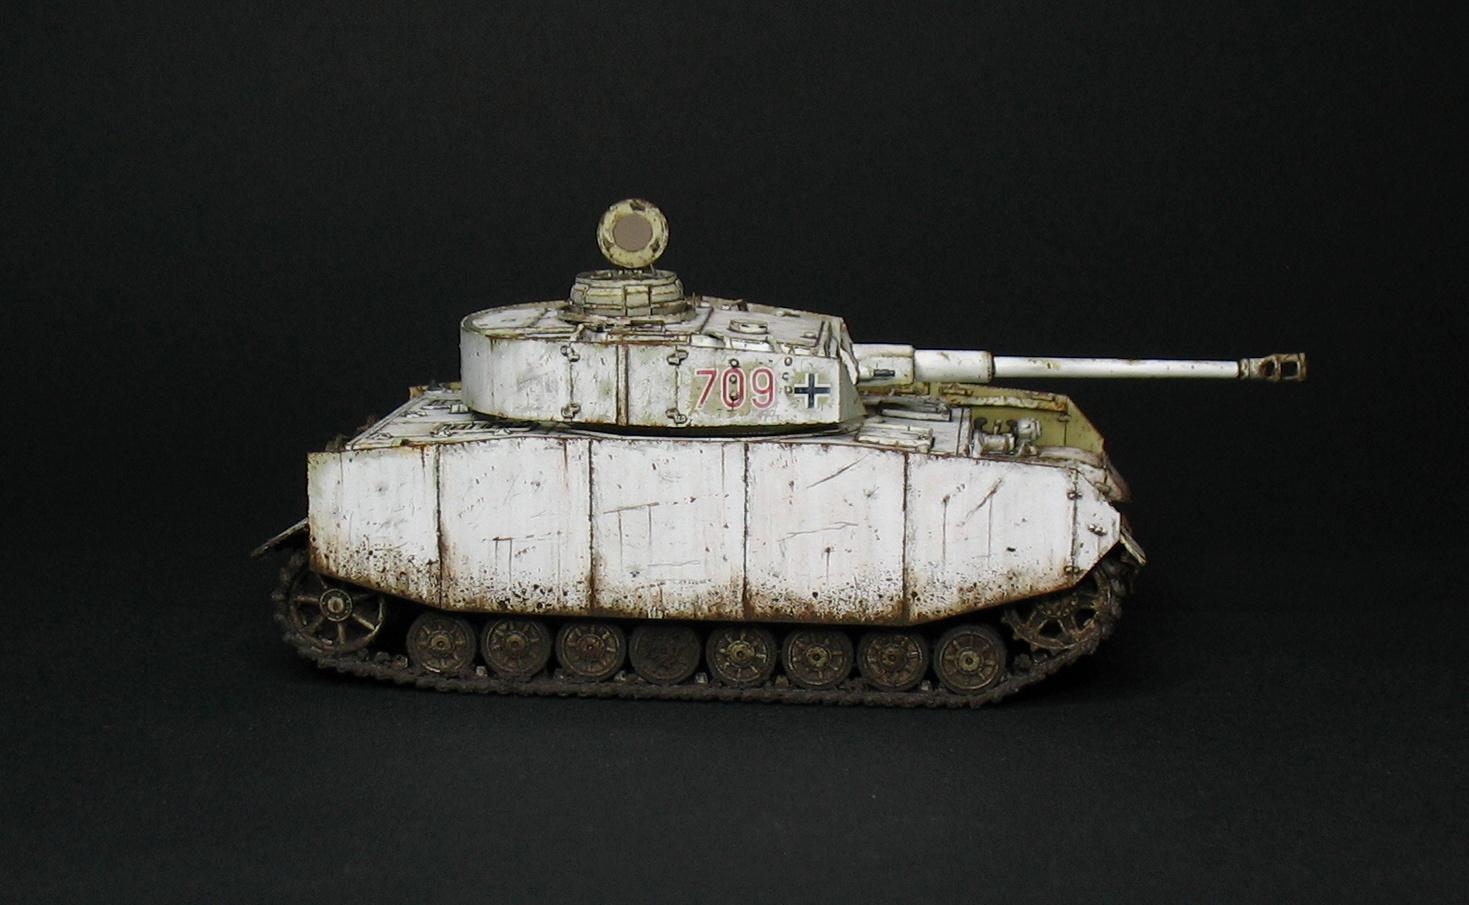 Model72 Miniatures: Panzer IV Ausf. H - Revell 1/72 - vol.2